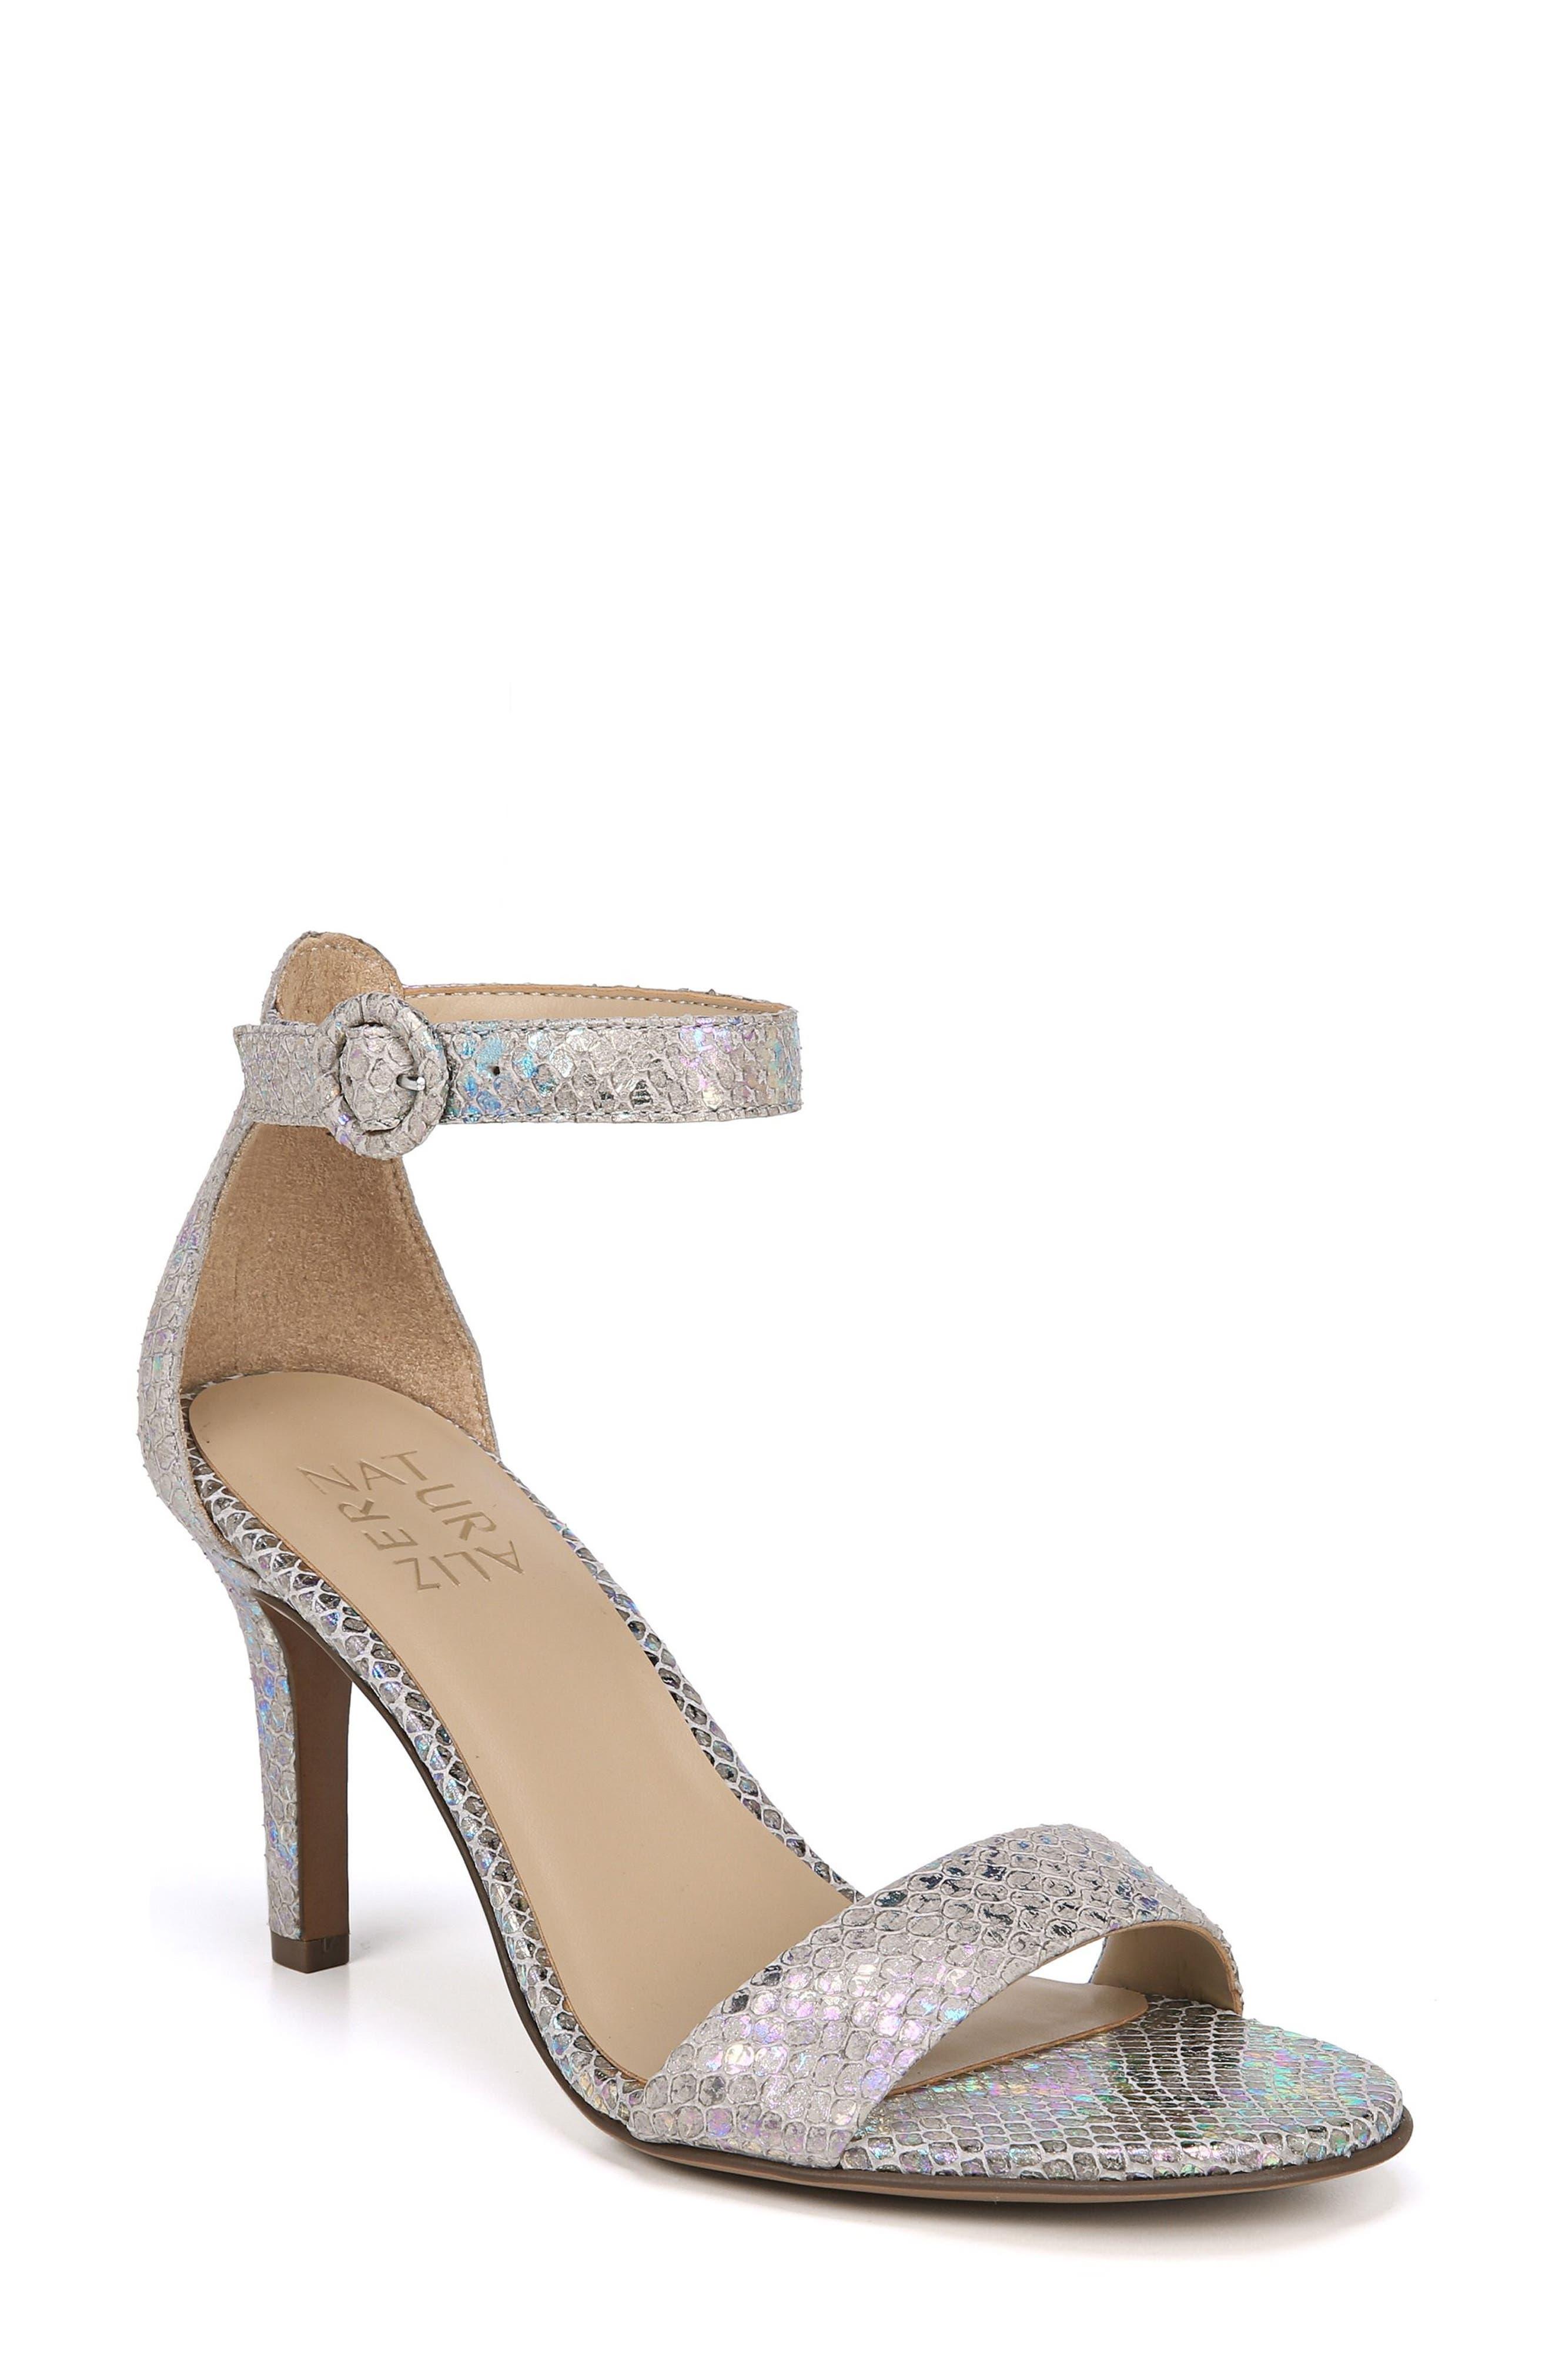 NATURALIZER Kinsley Ankle Strap Sandal, Main, color, SILVER SNAKE LEATHER